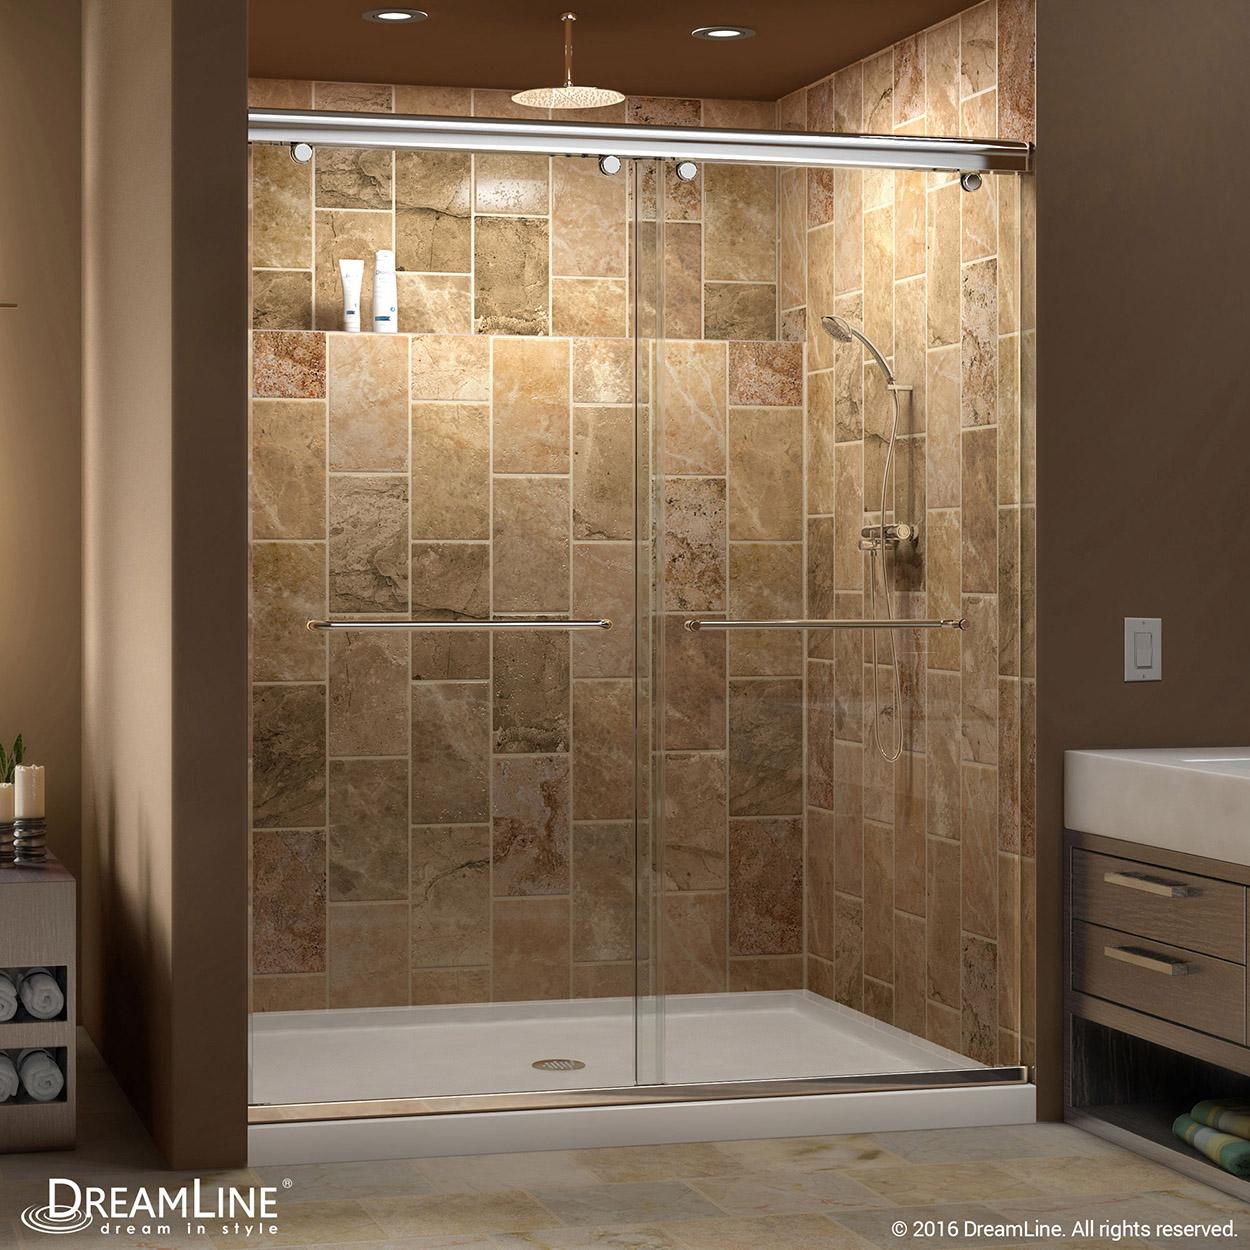 Bath4All - DreamLine DL-6943C-04CL Charisma Frameless Sliding Shower ...